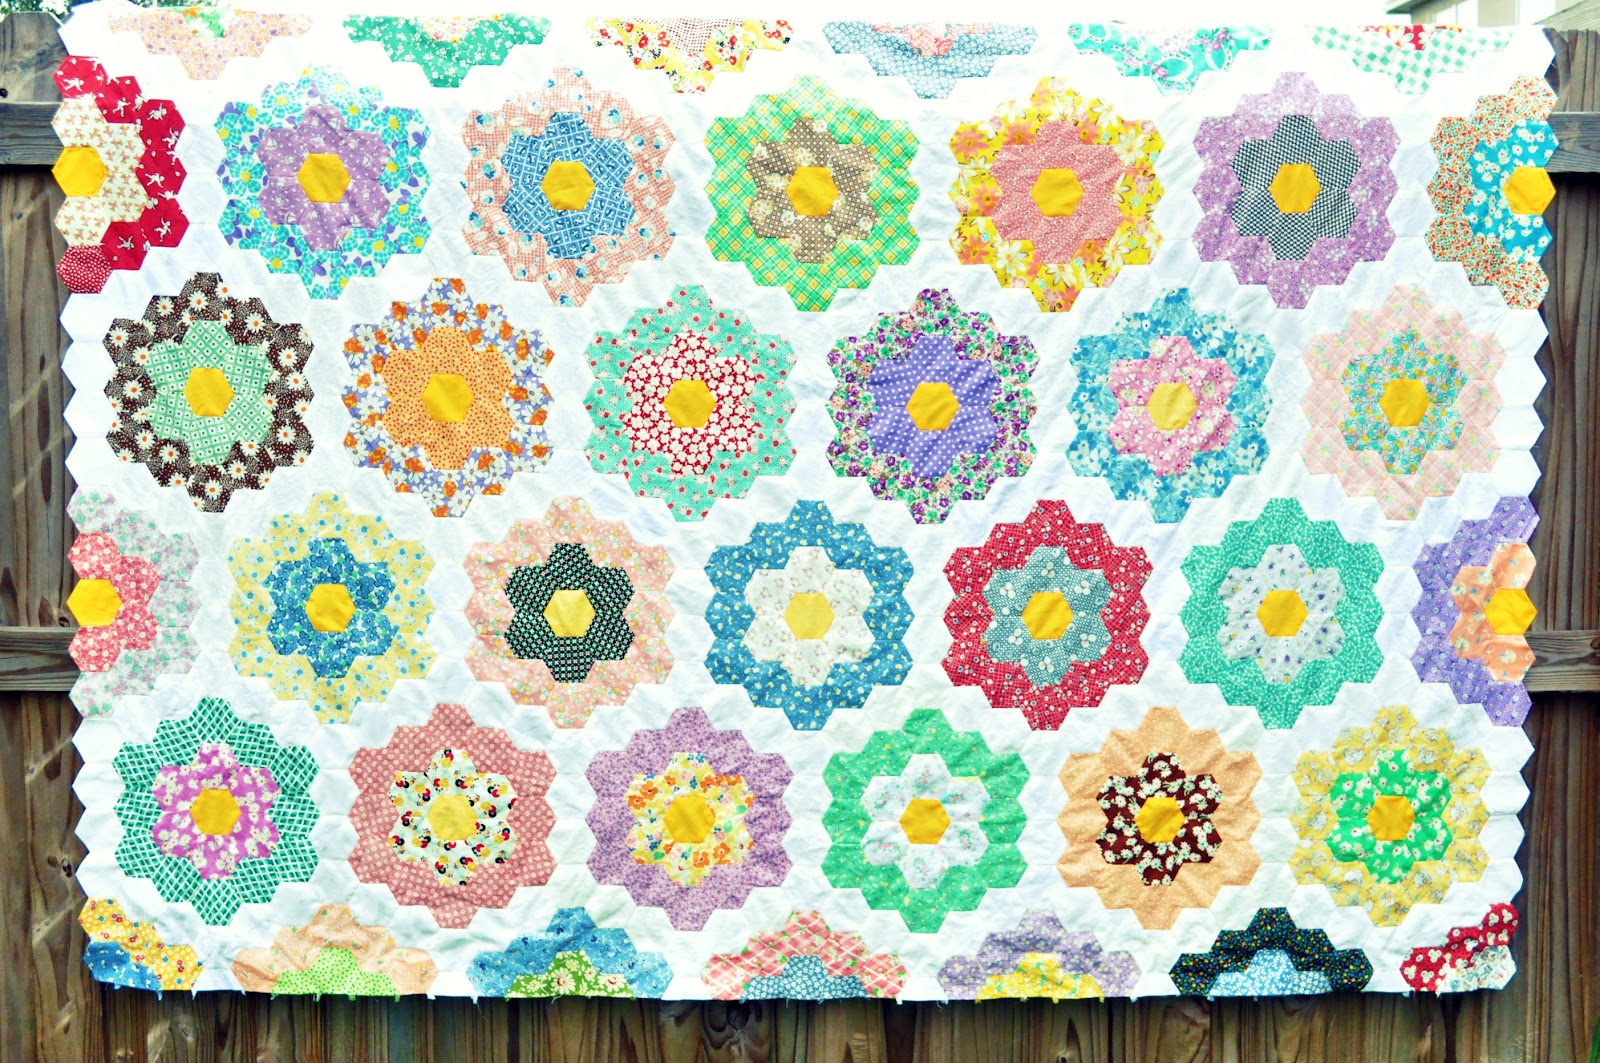 Sweet woodruffs grandmother 39 s flower garden quilt - Grandmother s flower garden quilt ...